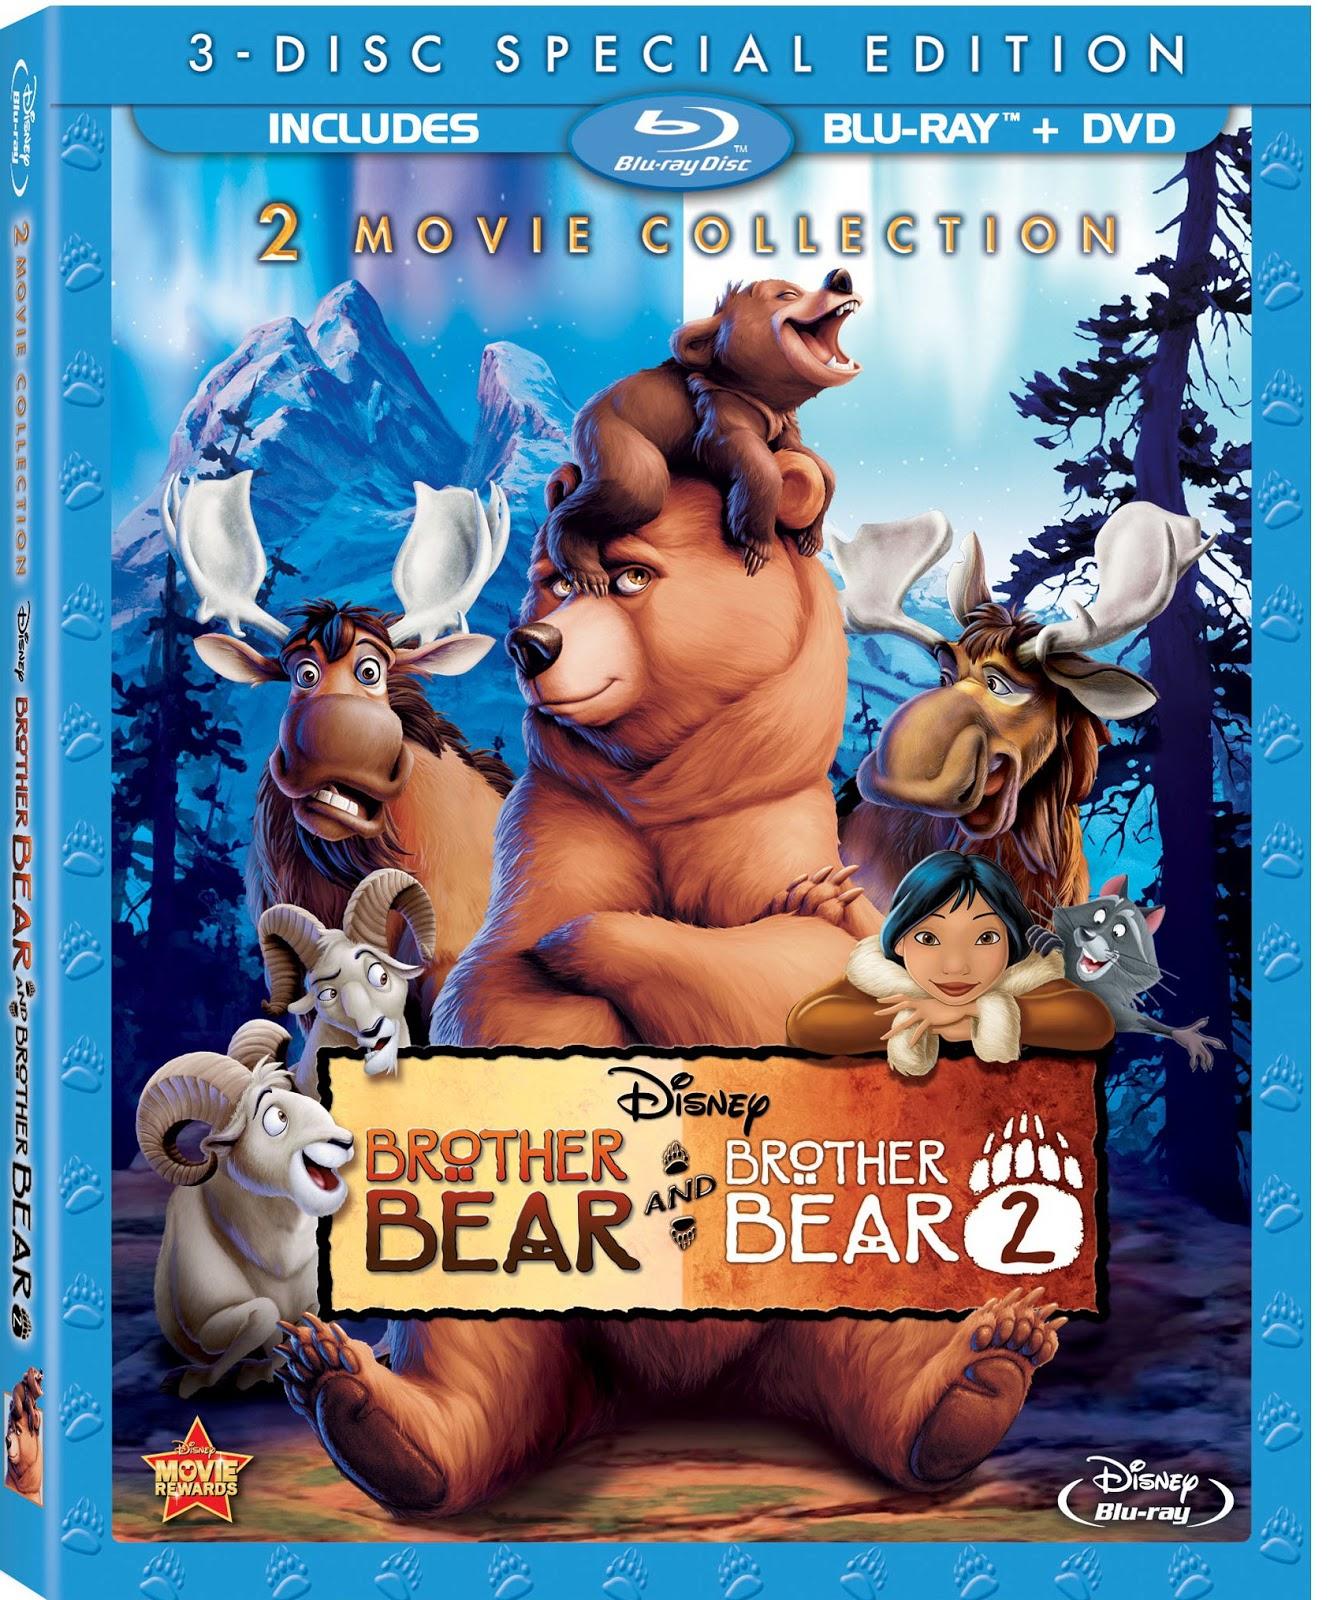 Disney Soul: Portada oficial de Hermano Oso + Hermano Oso 2 (Blu-Ray)